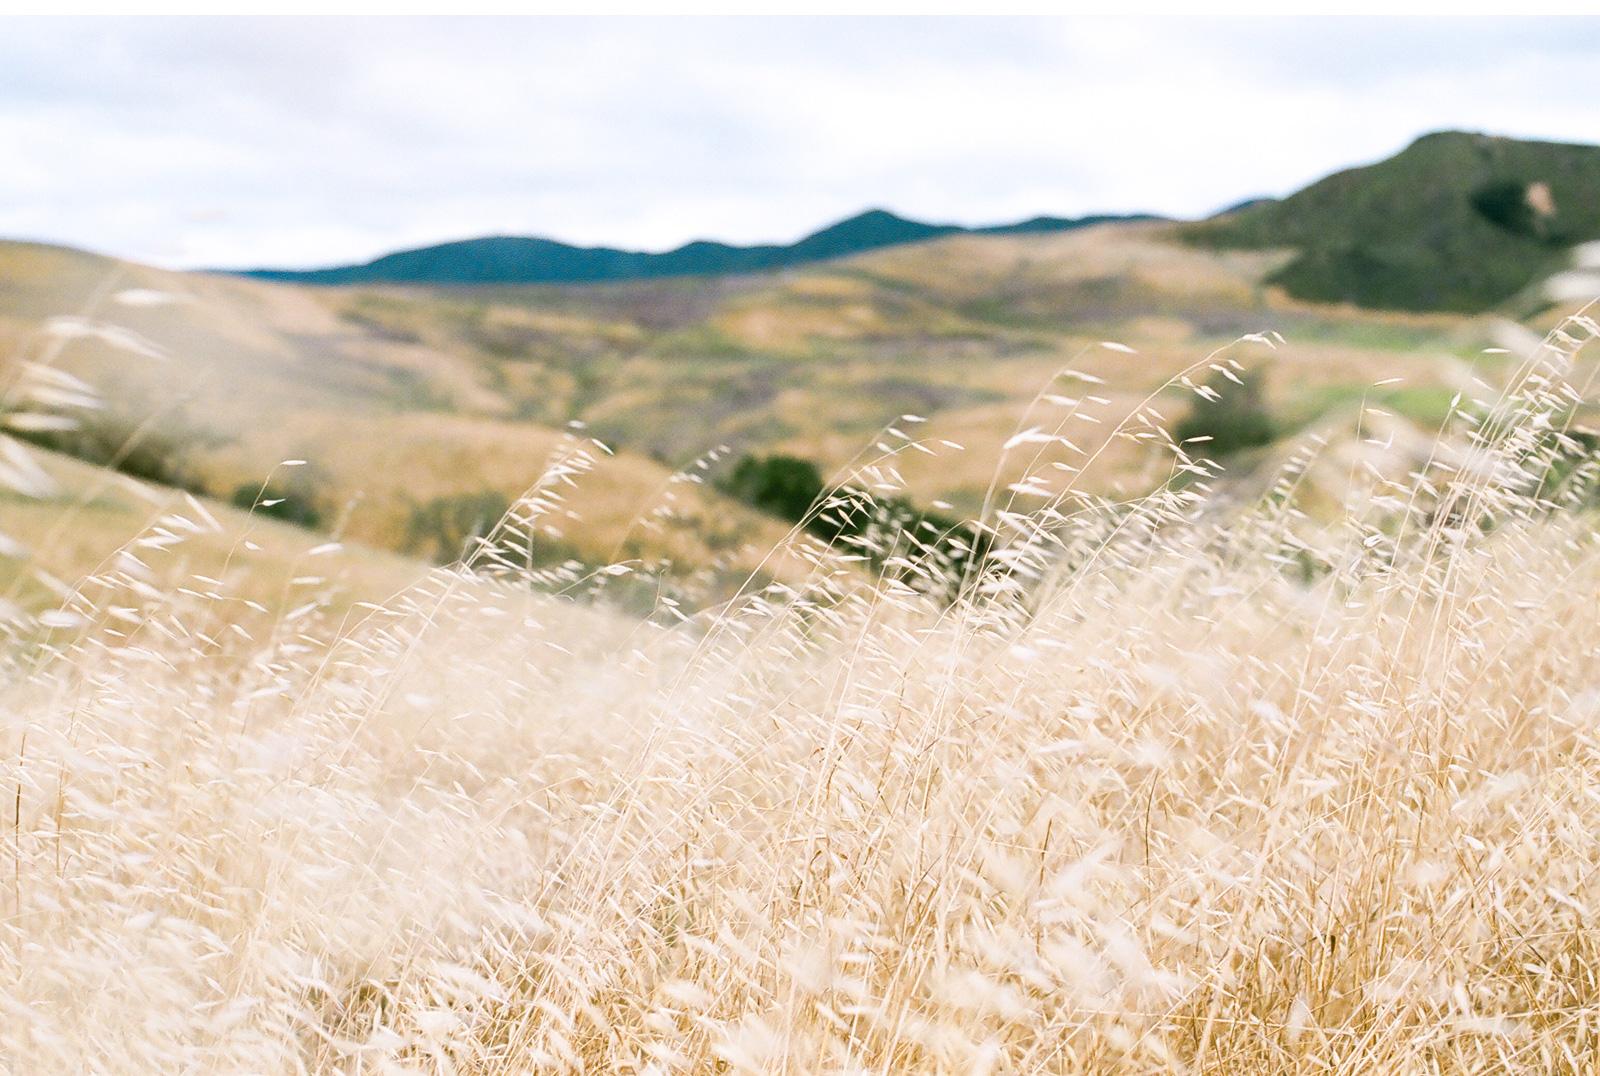 Whispering-Rose-Ranch-Wedding-Natalie-Schutt-Fine-Art-Photography-Style-Me-Pretty_10.jpg